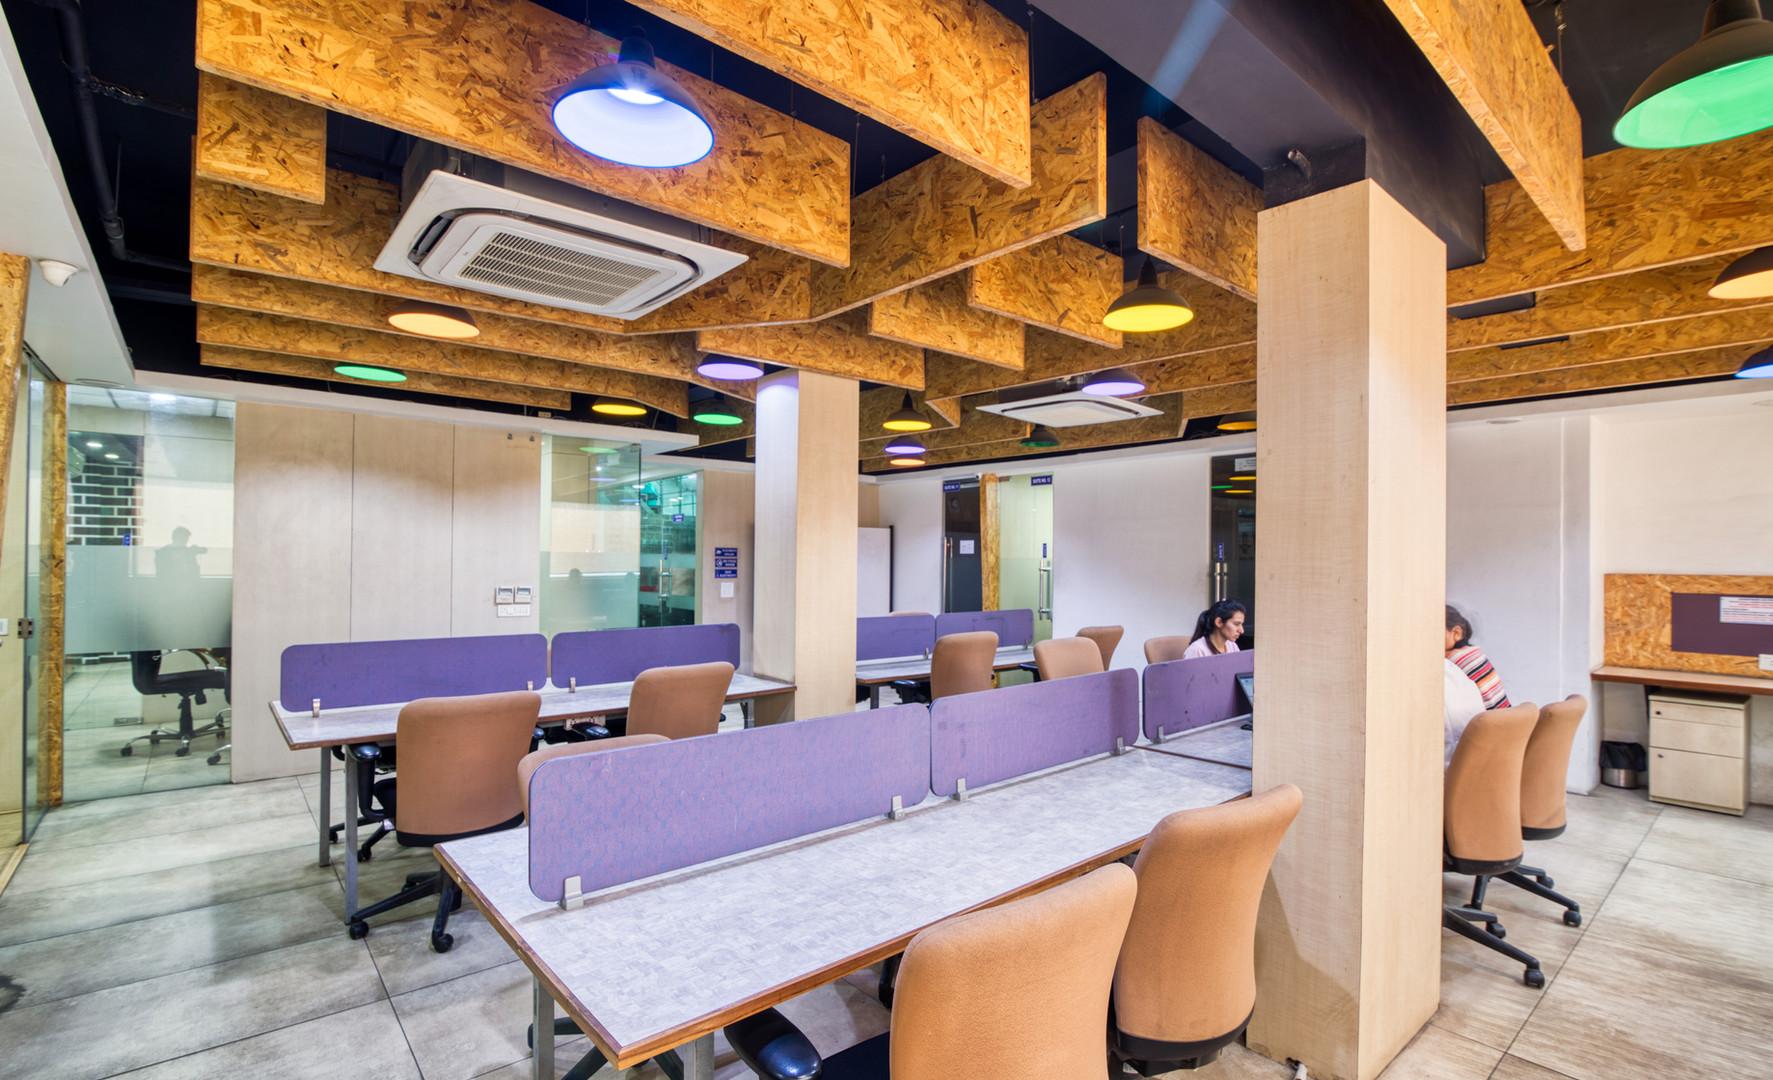 22 Workspaces New Delhi 9.jpeg